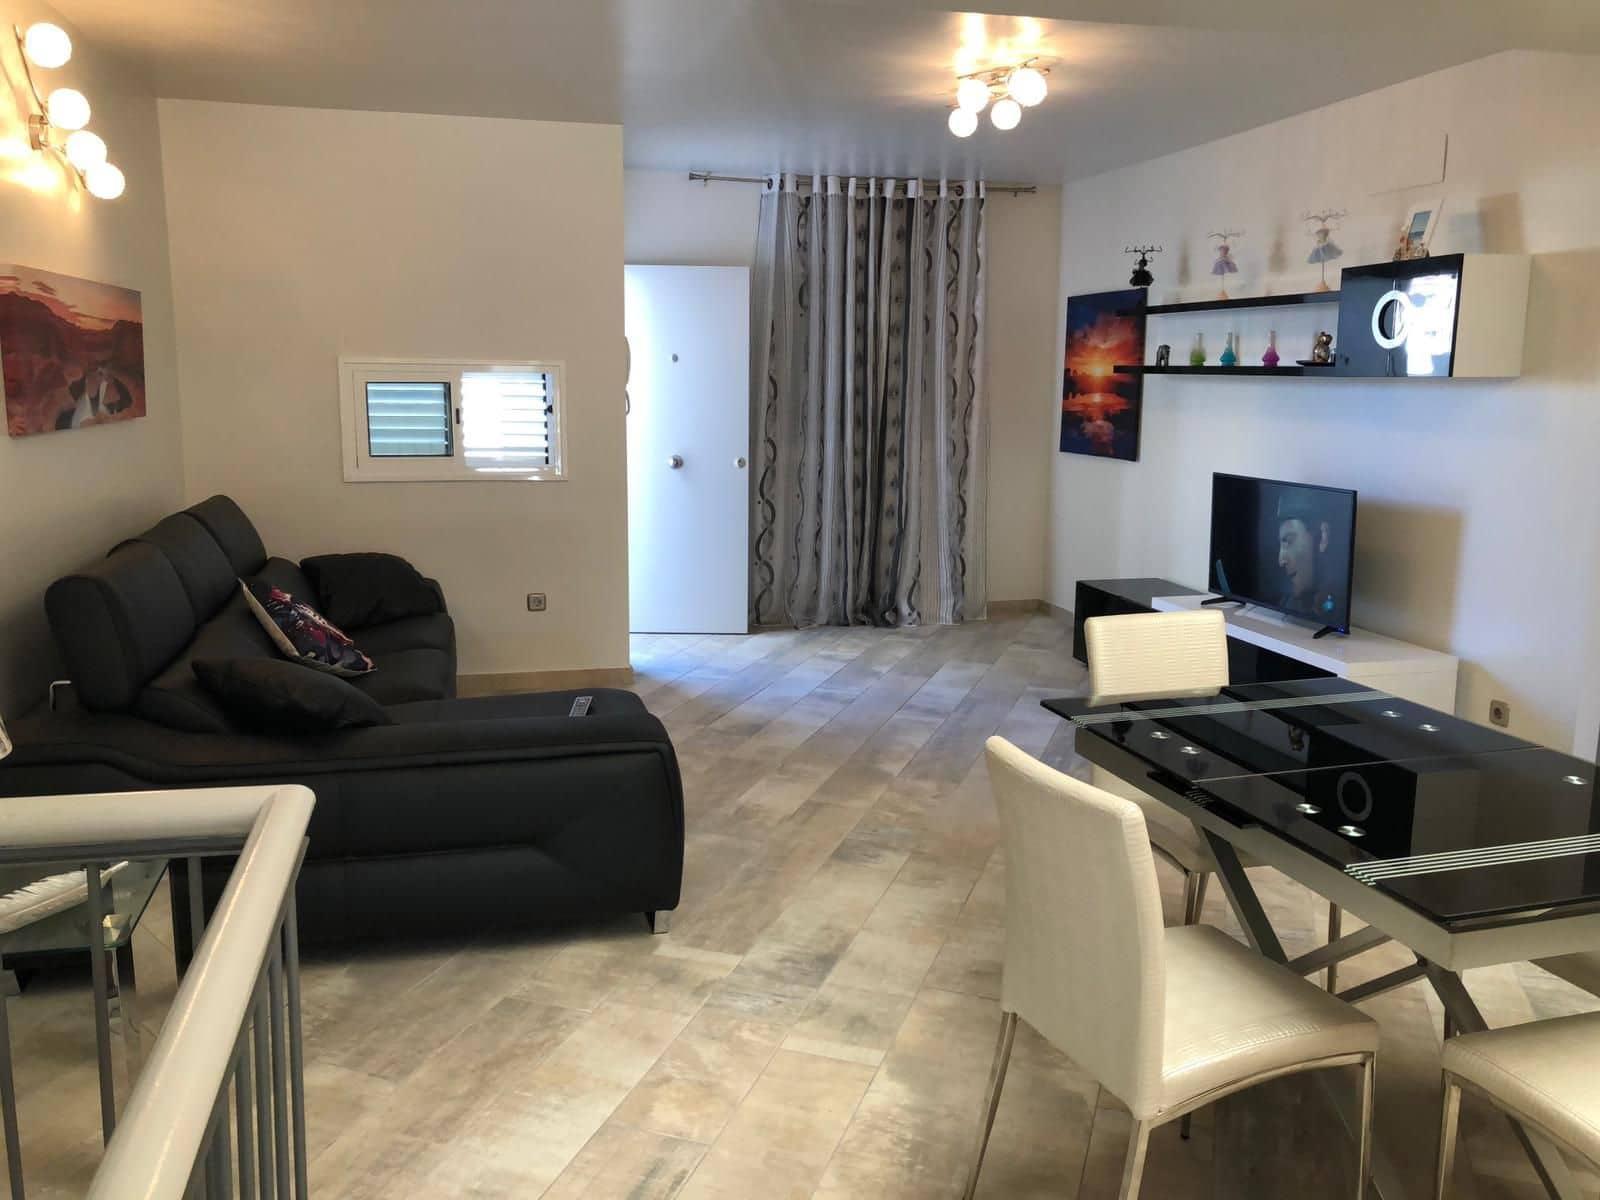 2 bedroom Apartment for rent in Adeje with pool garage - € 1,400 (Ref: 5167040)